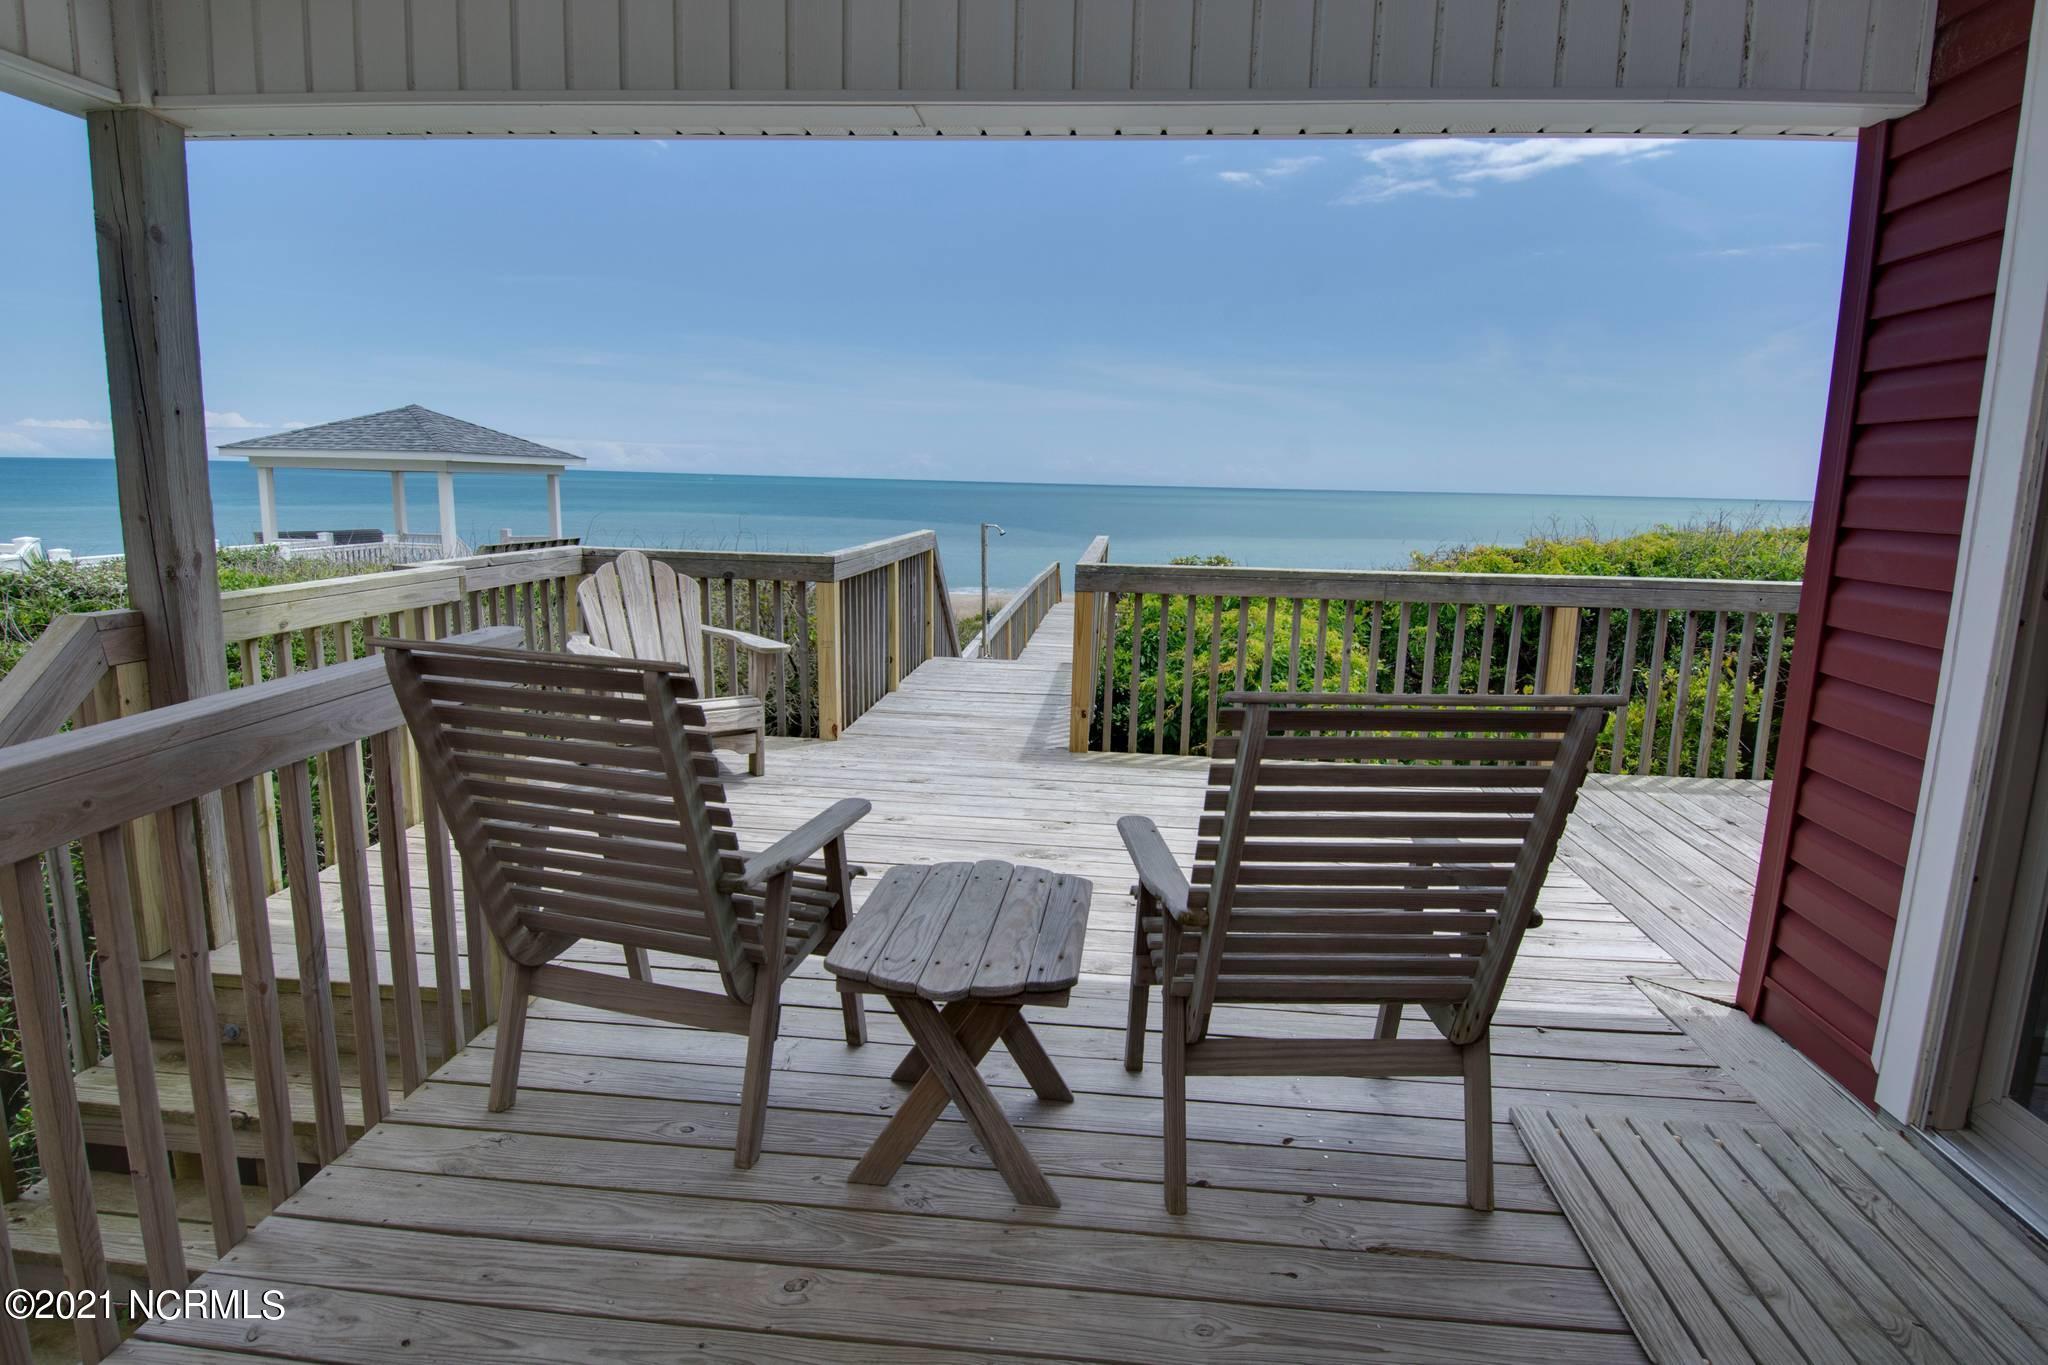 7309 Ocean Drive, Emerald Isle, North Carolina 28594, 3 Bedrooms Bedrooms, 6 Rooms Rooms,2 BathroomsBathrooms,Single family residence,For sale,Ocean,100274657